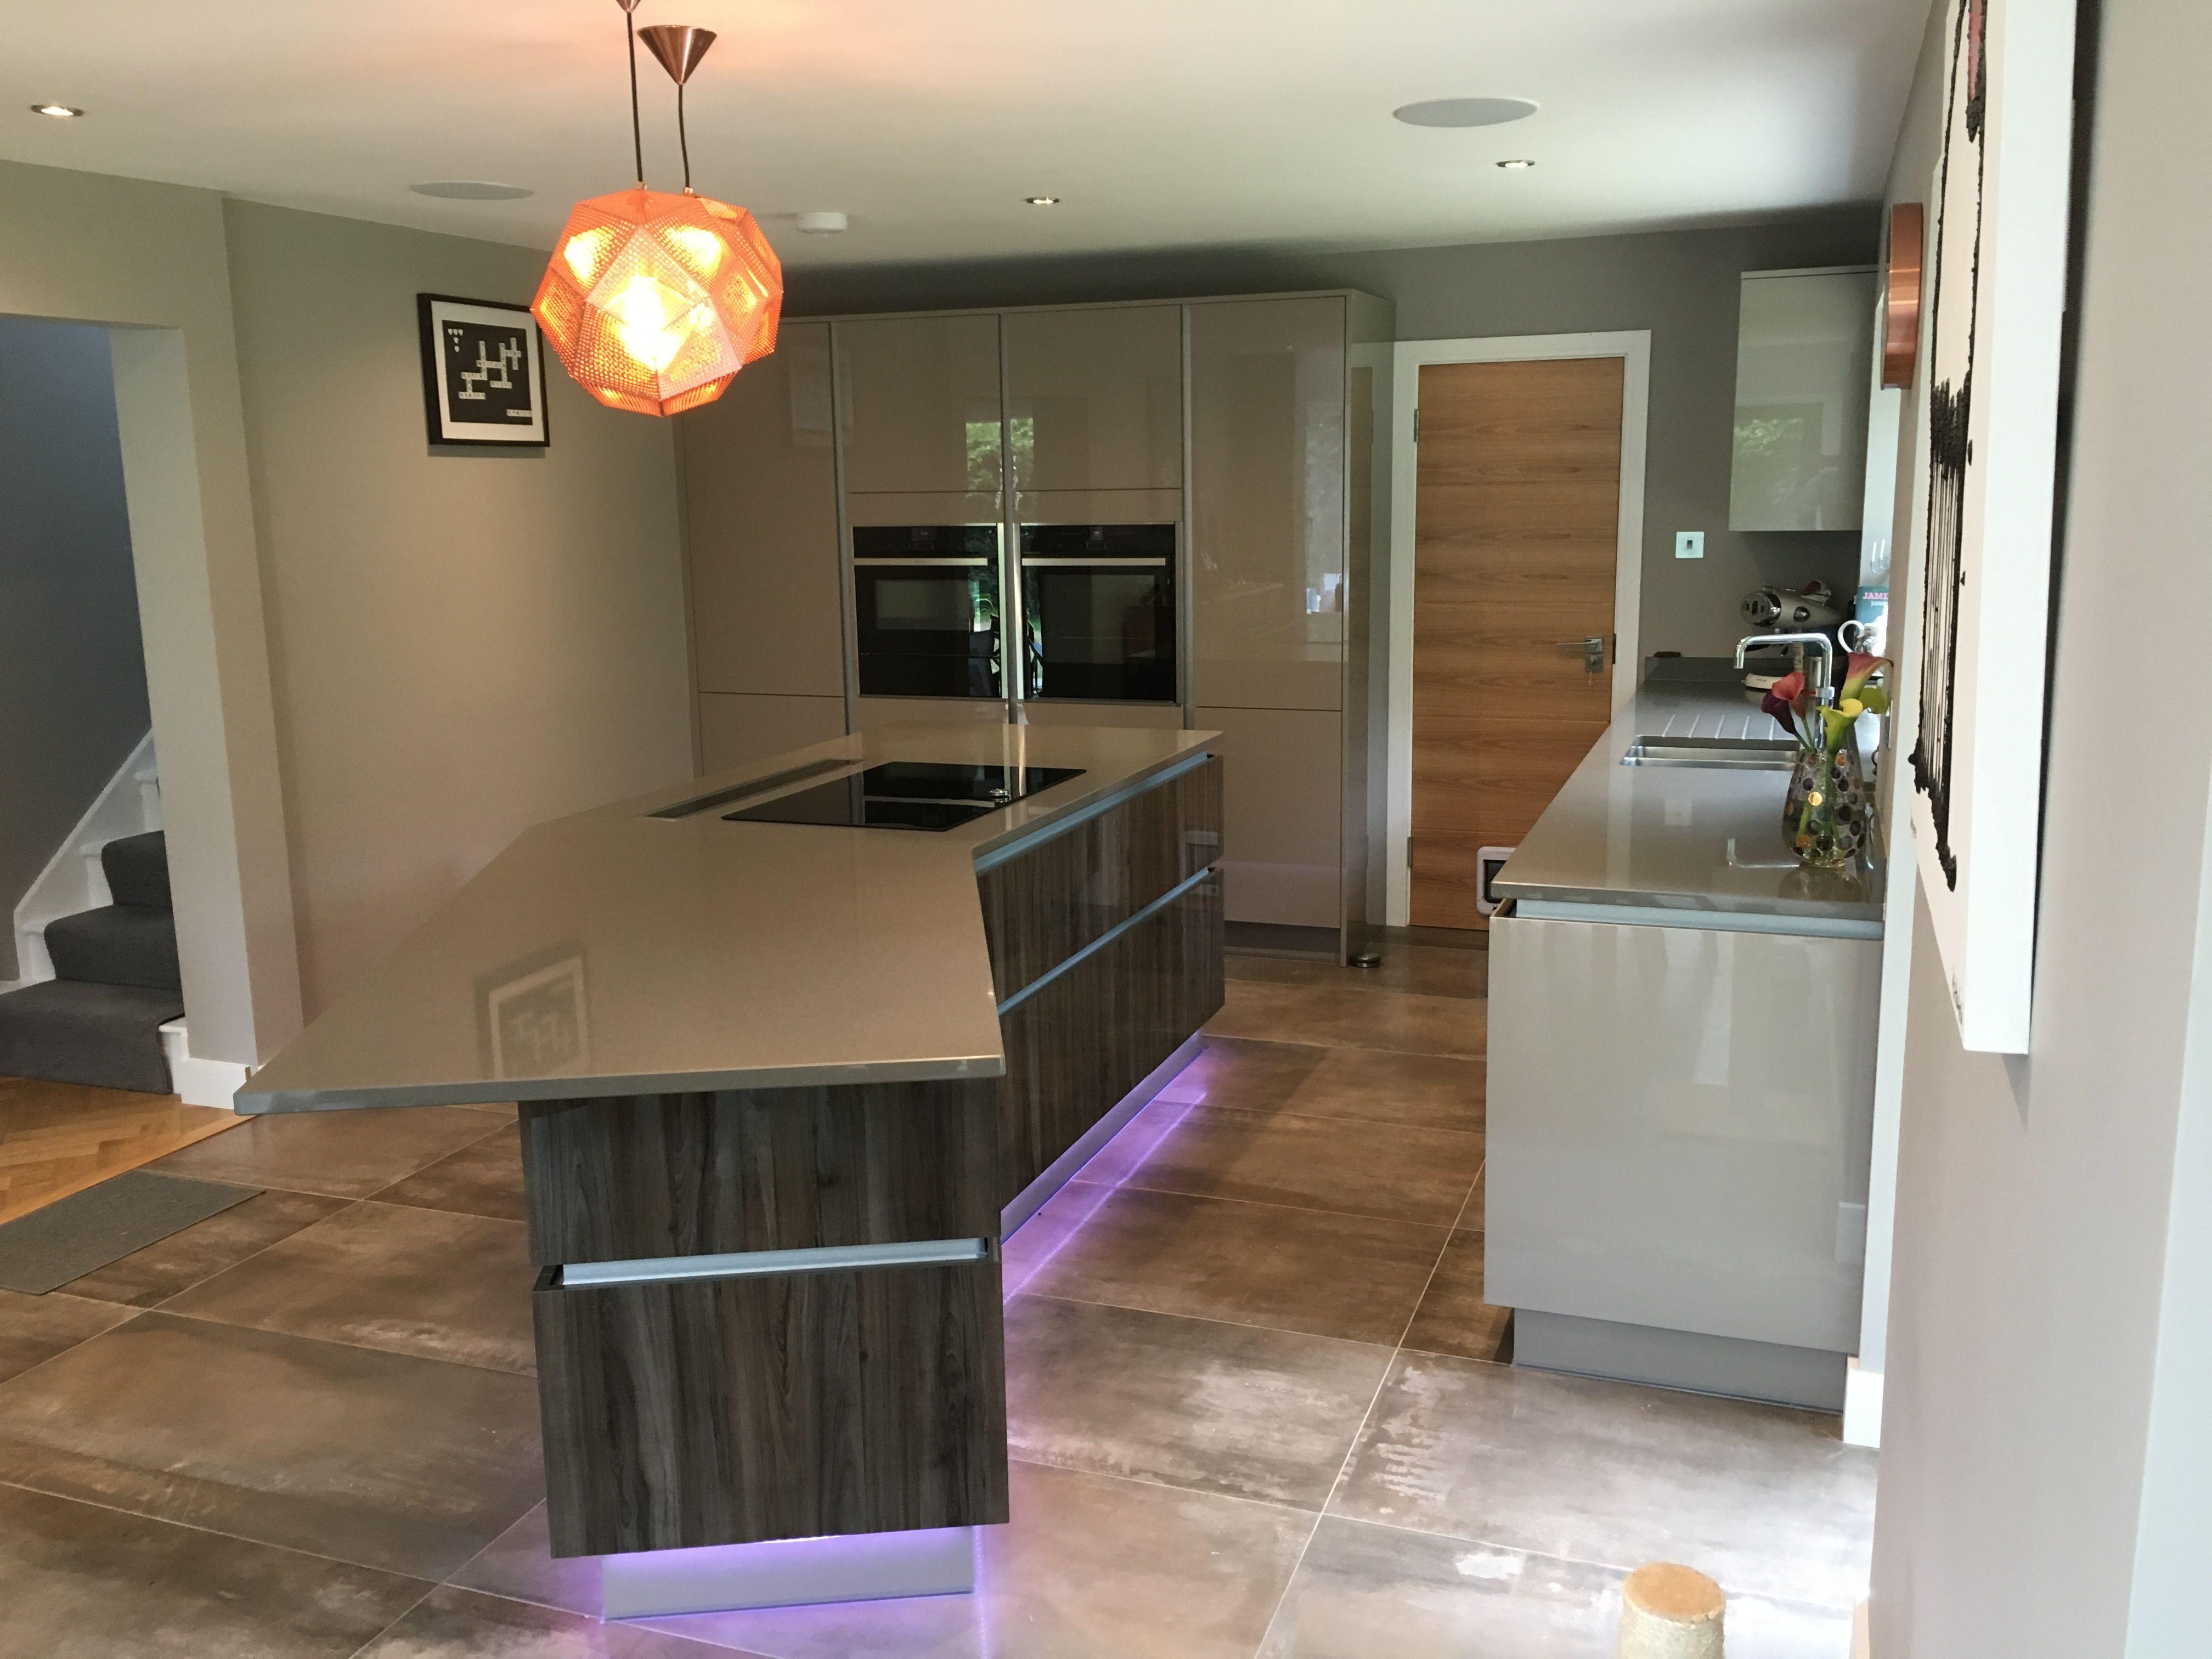 Kitchen Inspiration Handleless Lumina in Gloss Stone Grey with